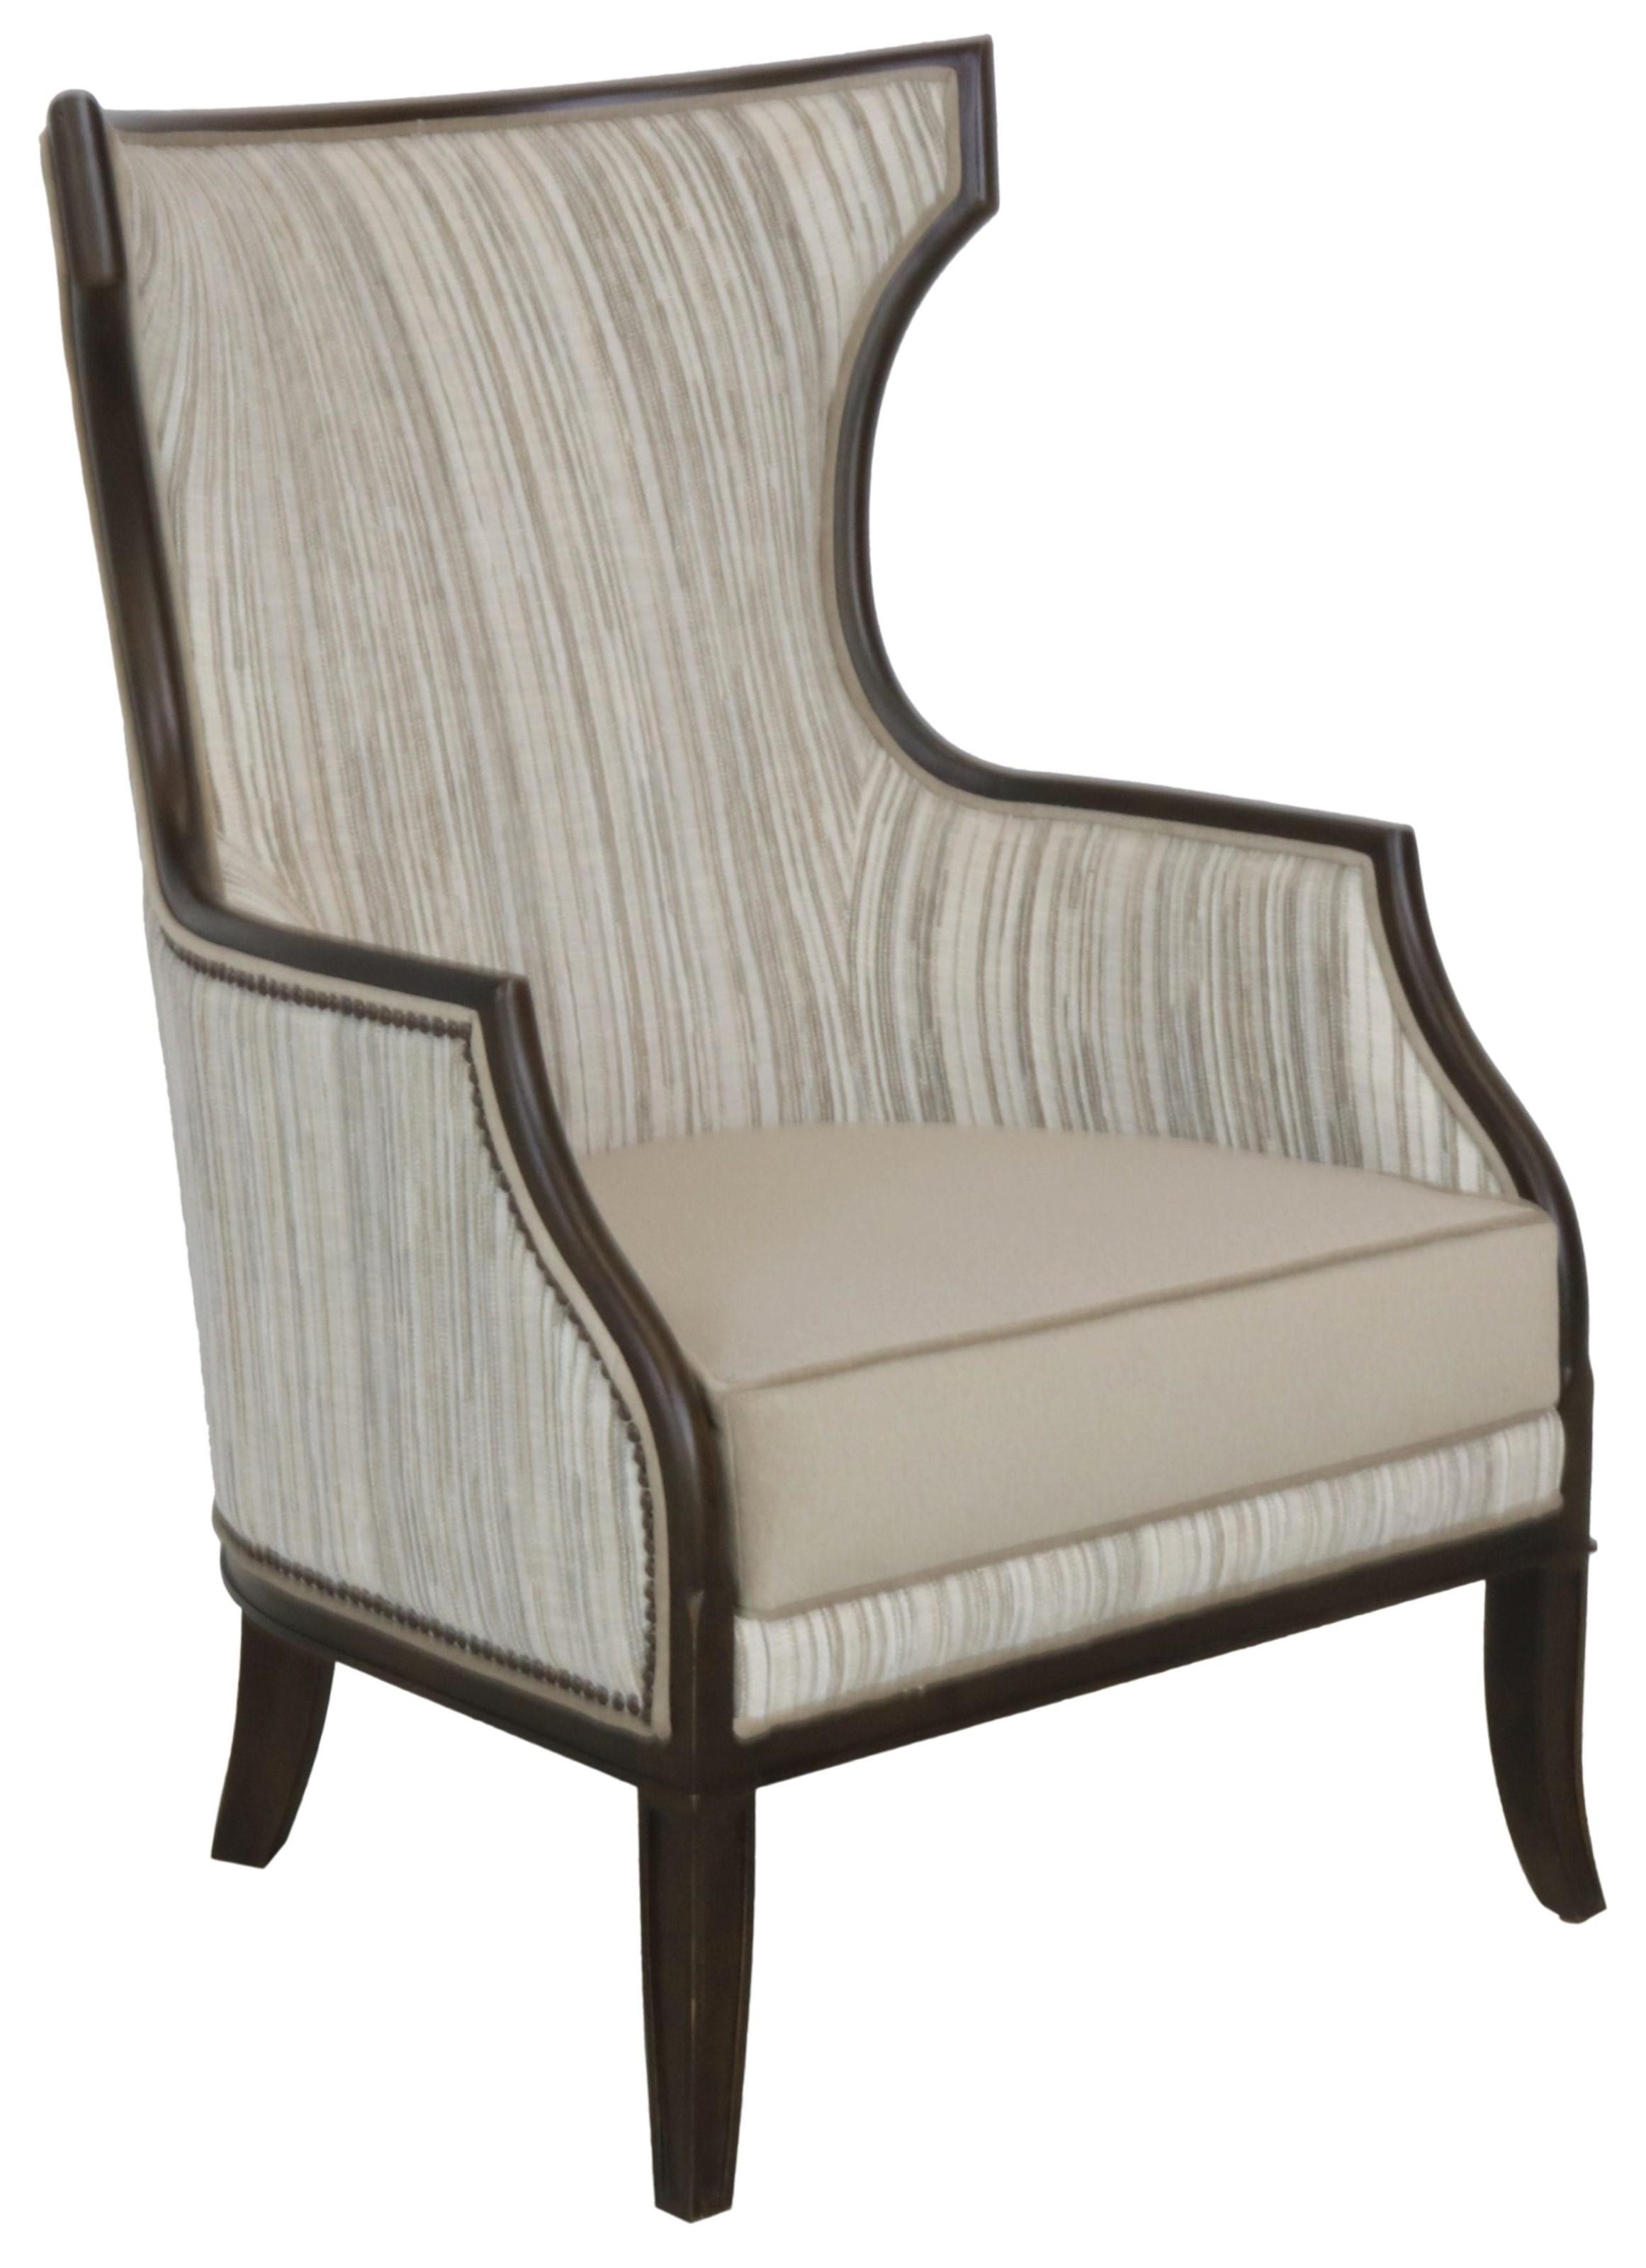 Grove Park Marcel Chair by Grove Park at Sprintz Furniture